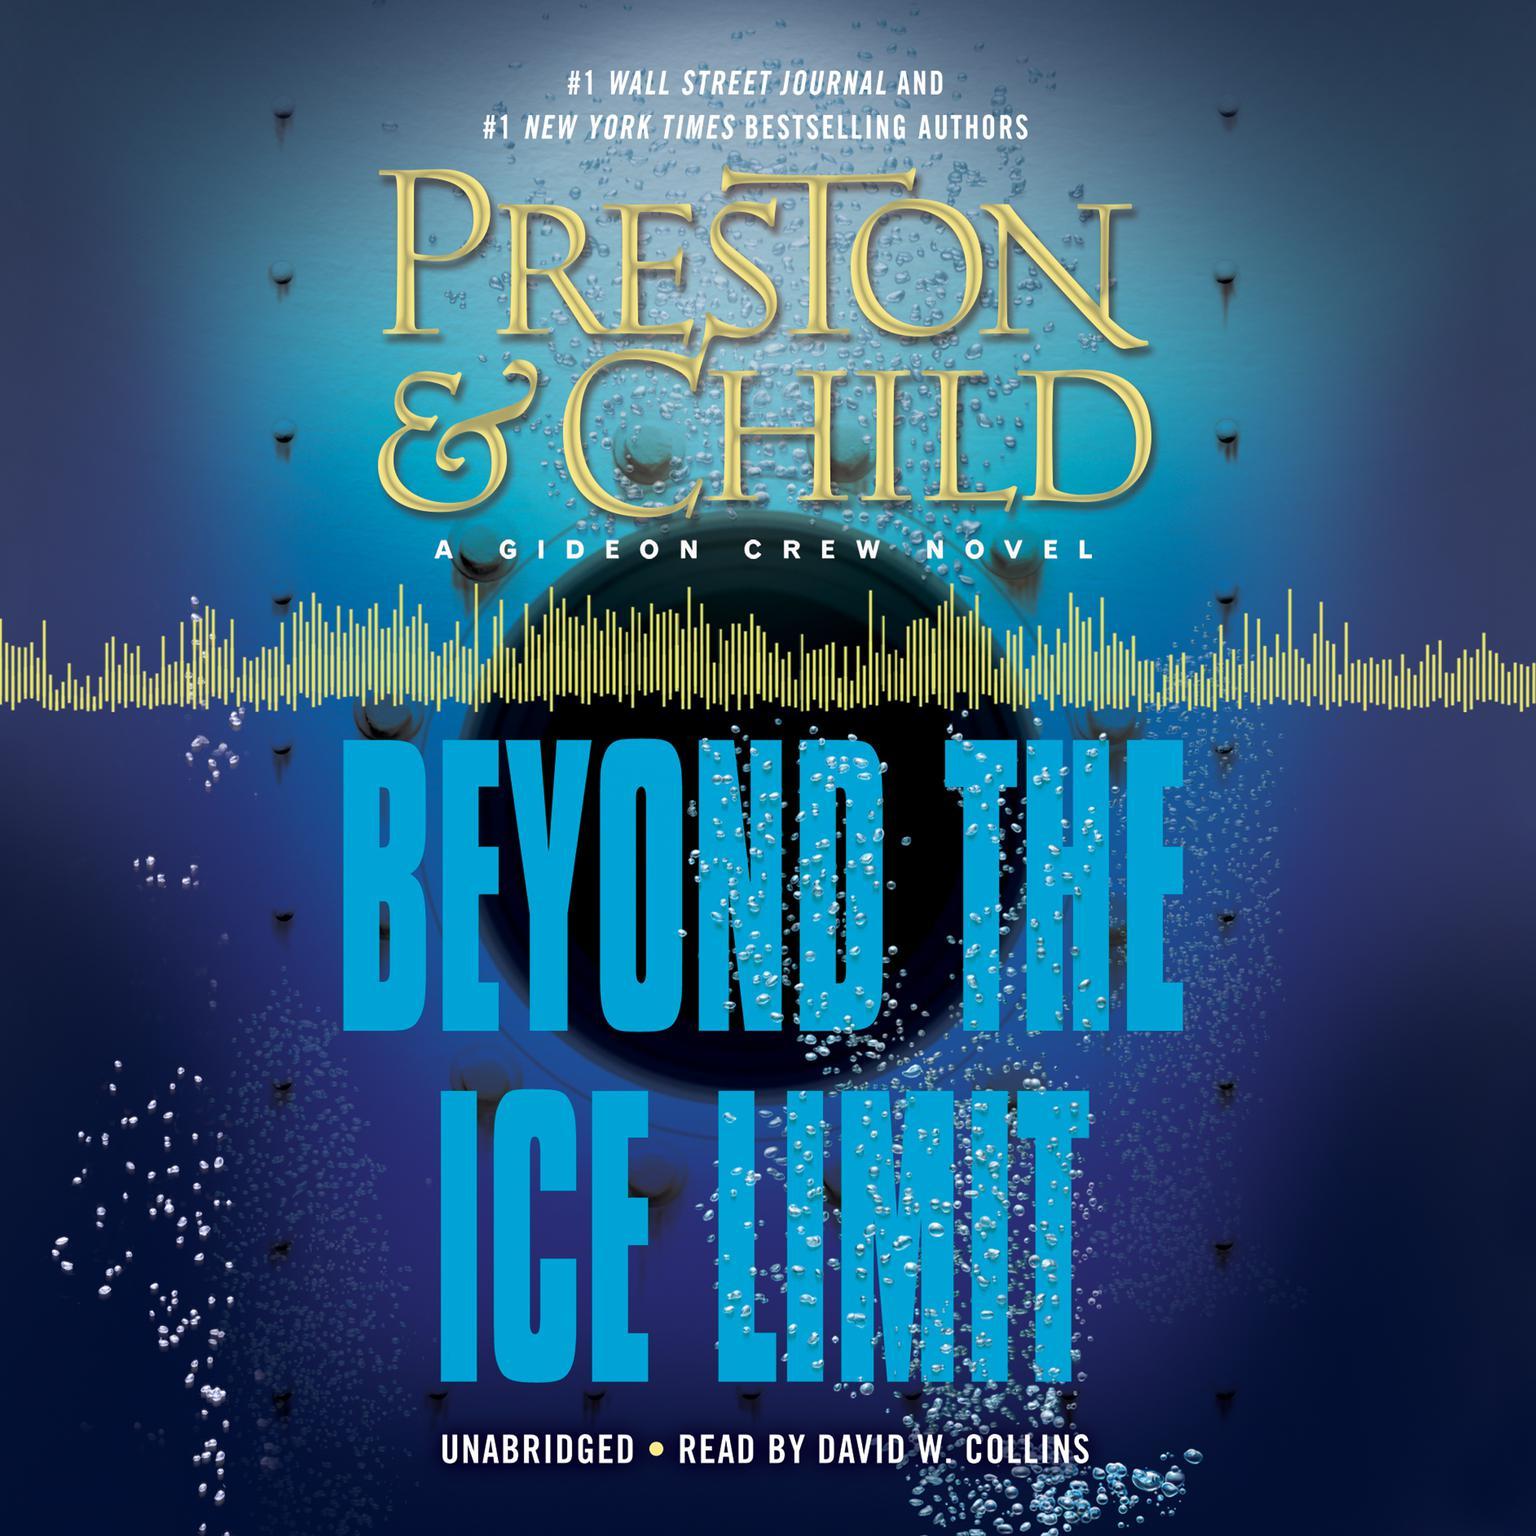 Beyond the Ice Limit: A Gideon Crew Novel Audiobook, by Douglas Preston